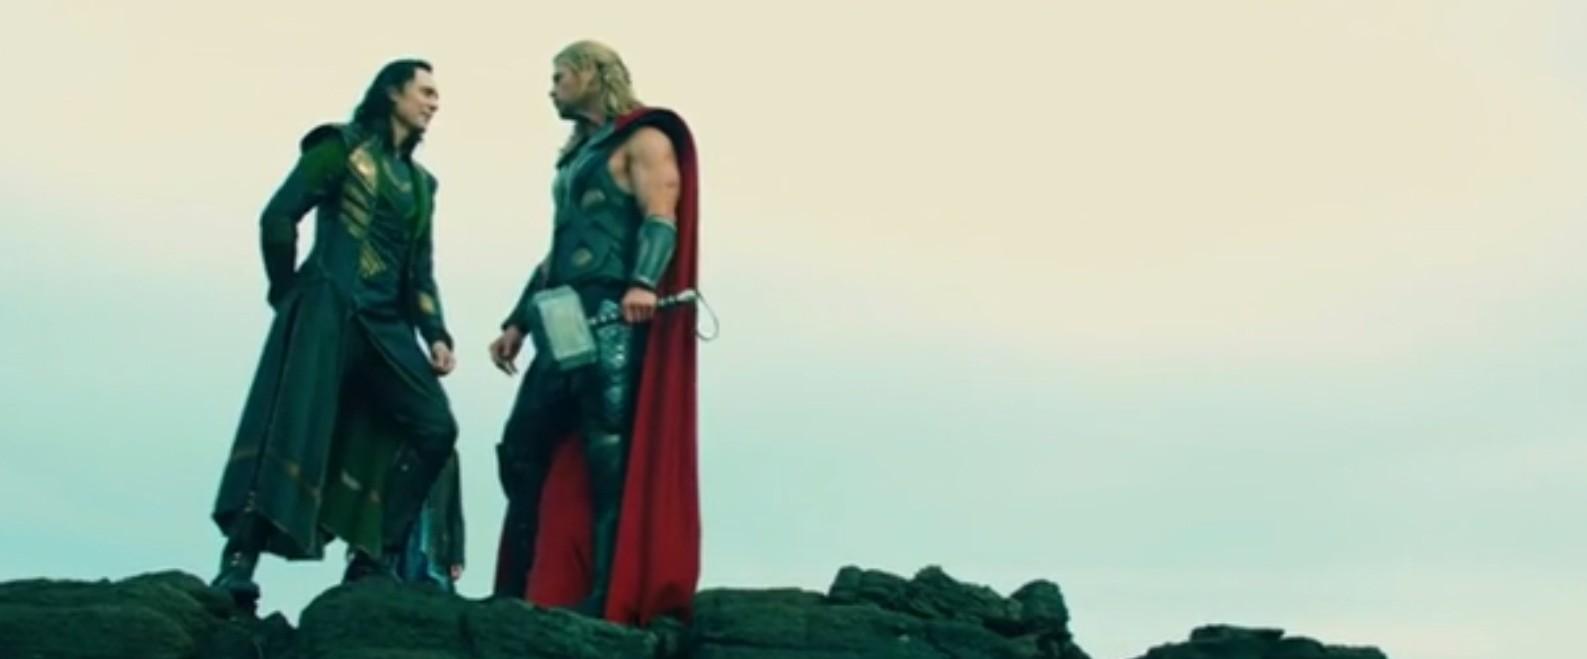 Tom Hiddleston and Chris Hemsworth mess around in Thor: The Dark World gag reel